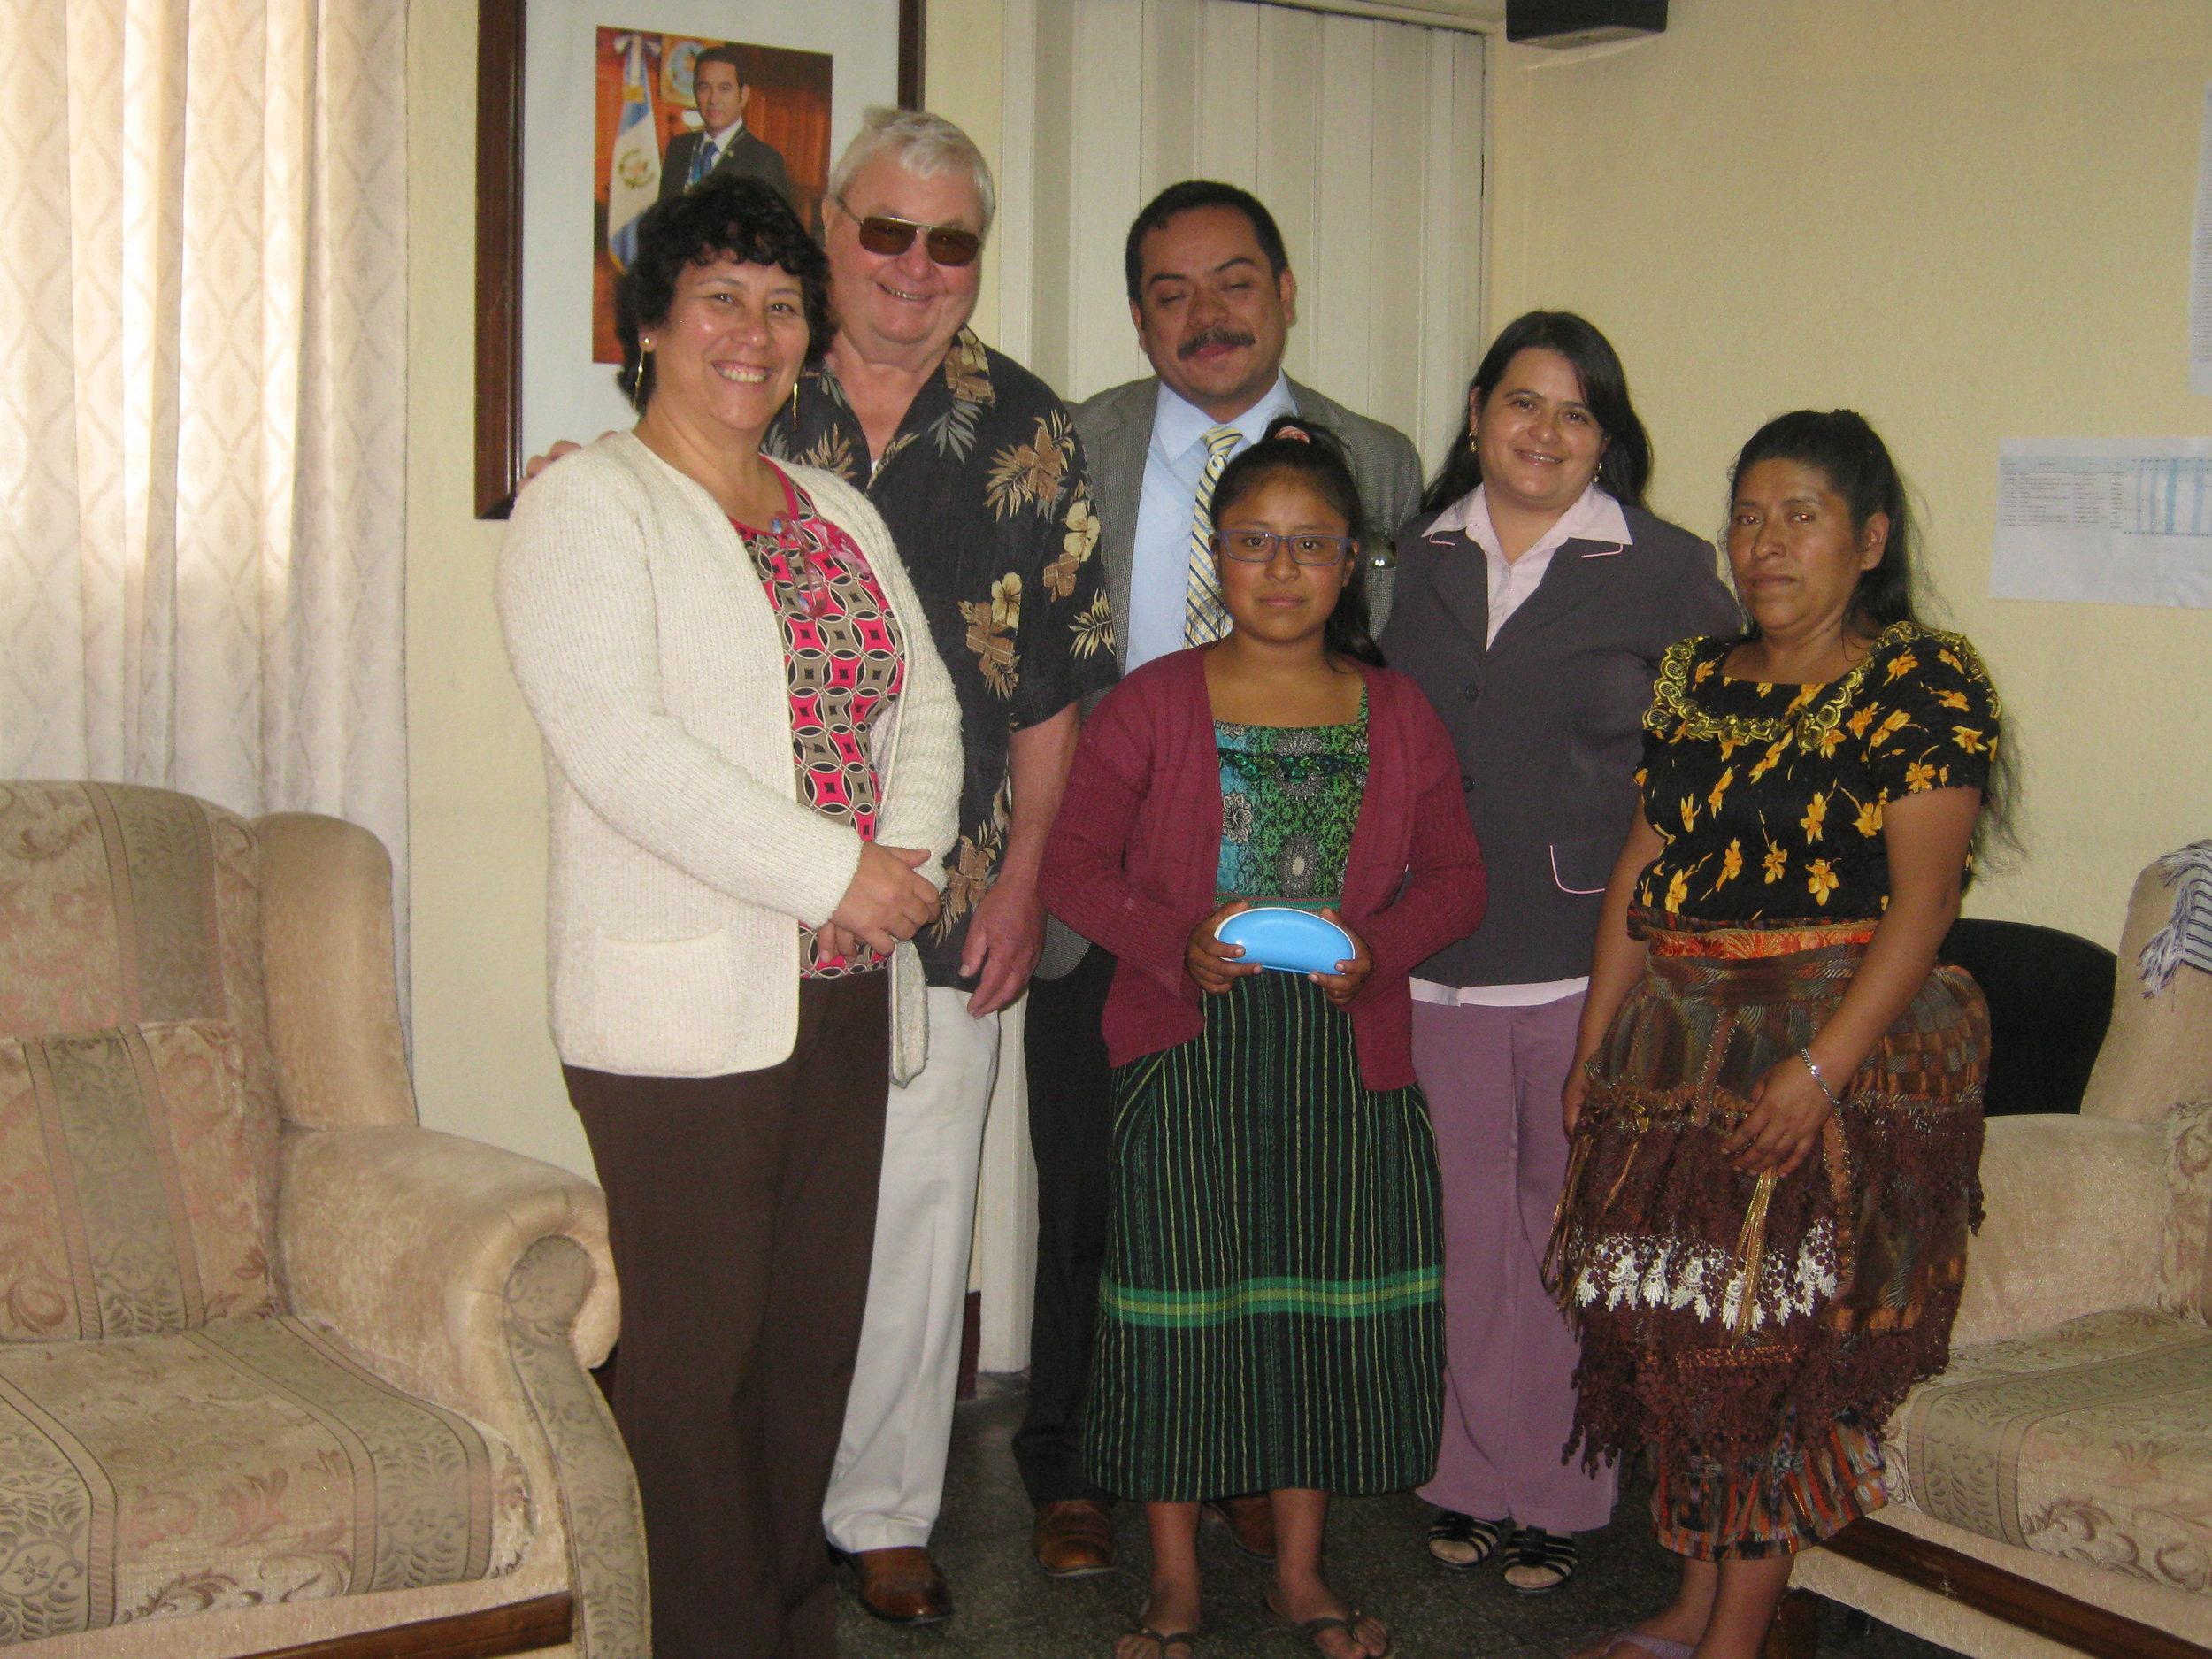 Karen Estefania Tepaz Coroy Receives Her Prescription Glasses from Gordon Flattum of VRI